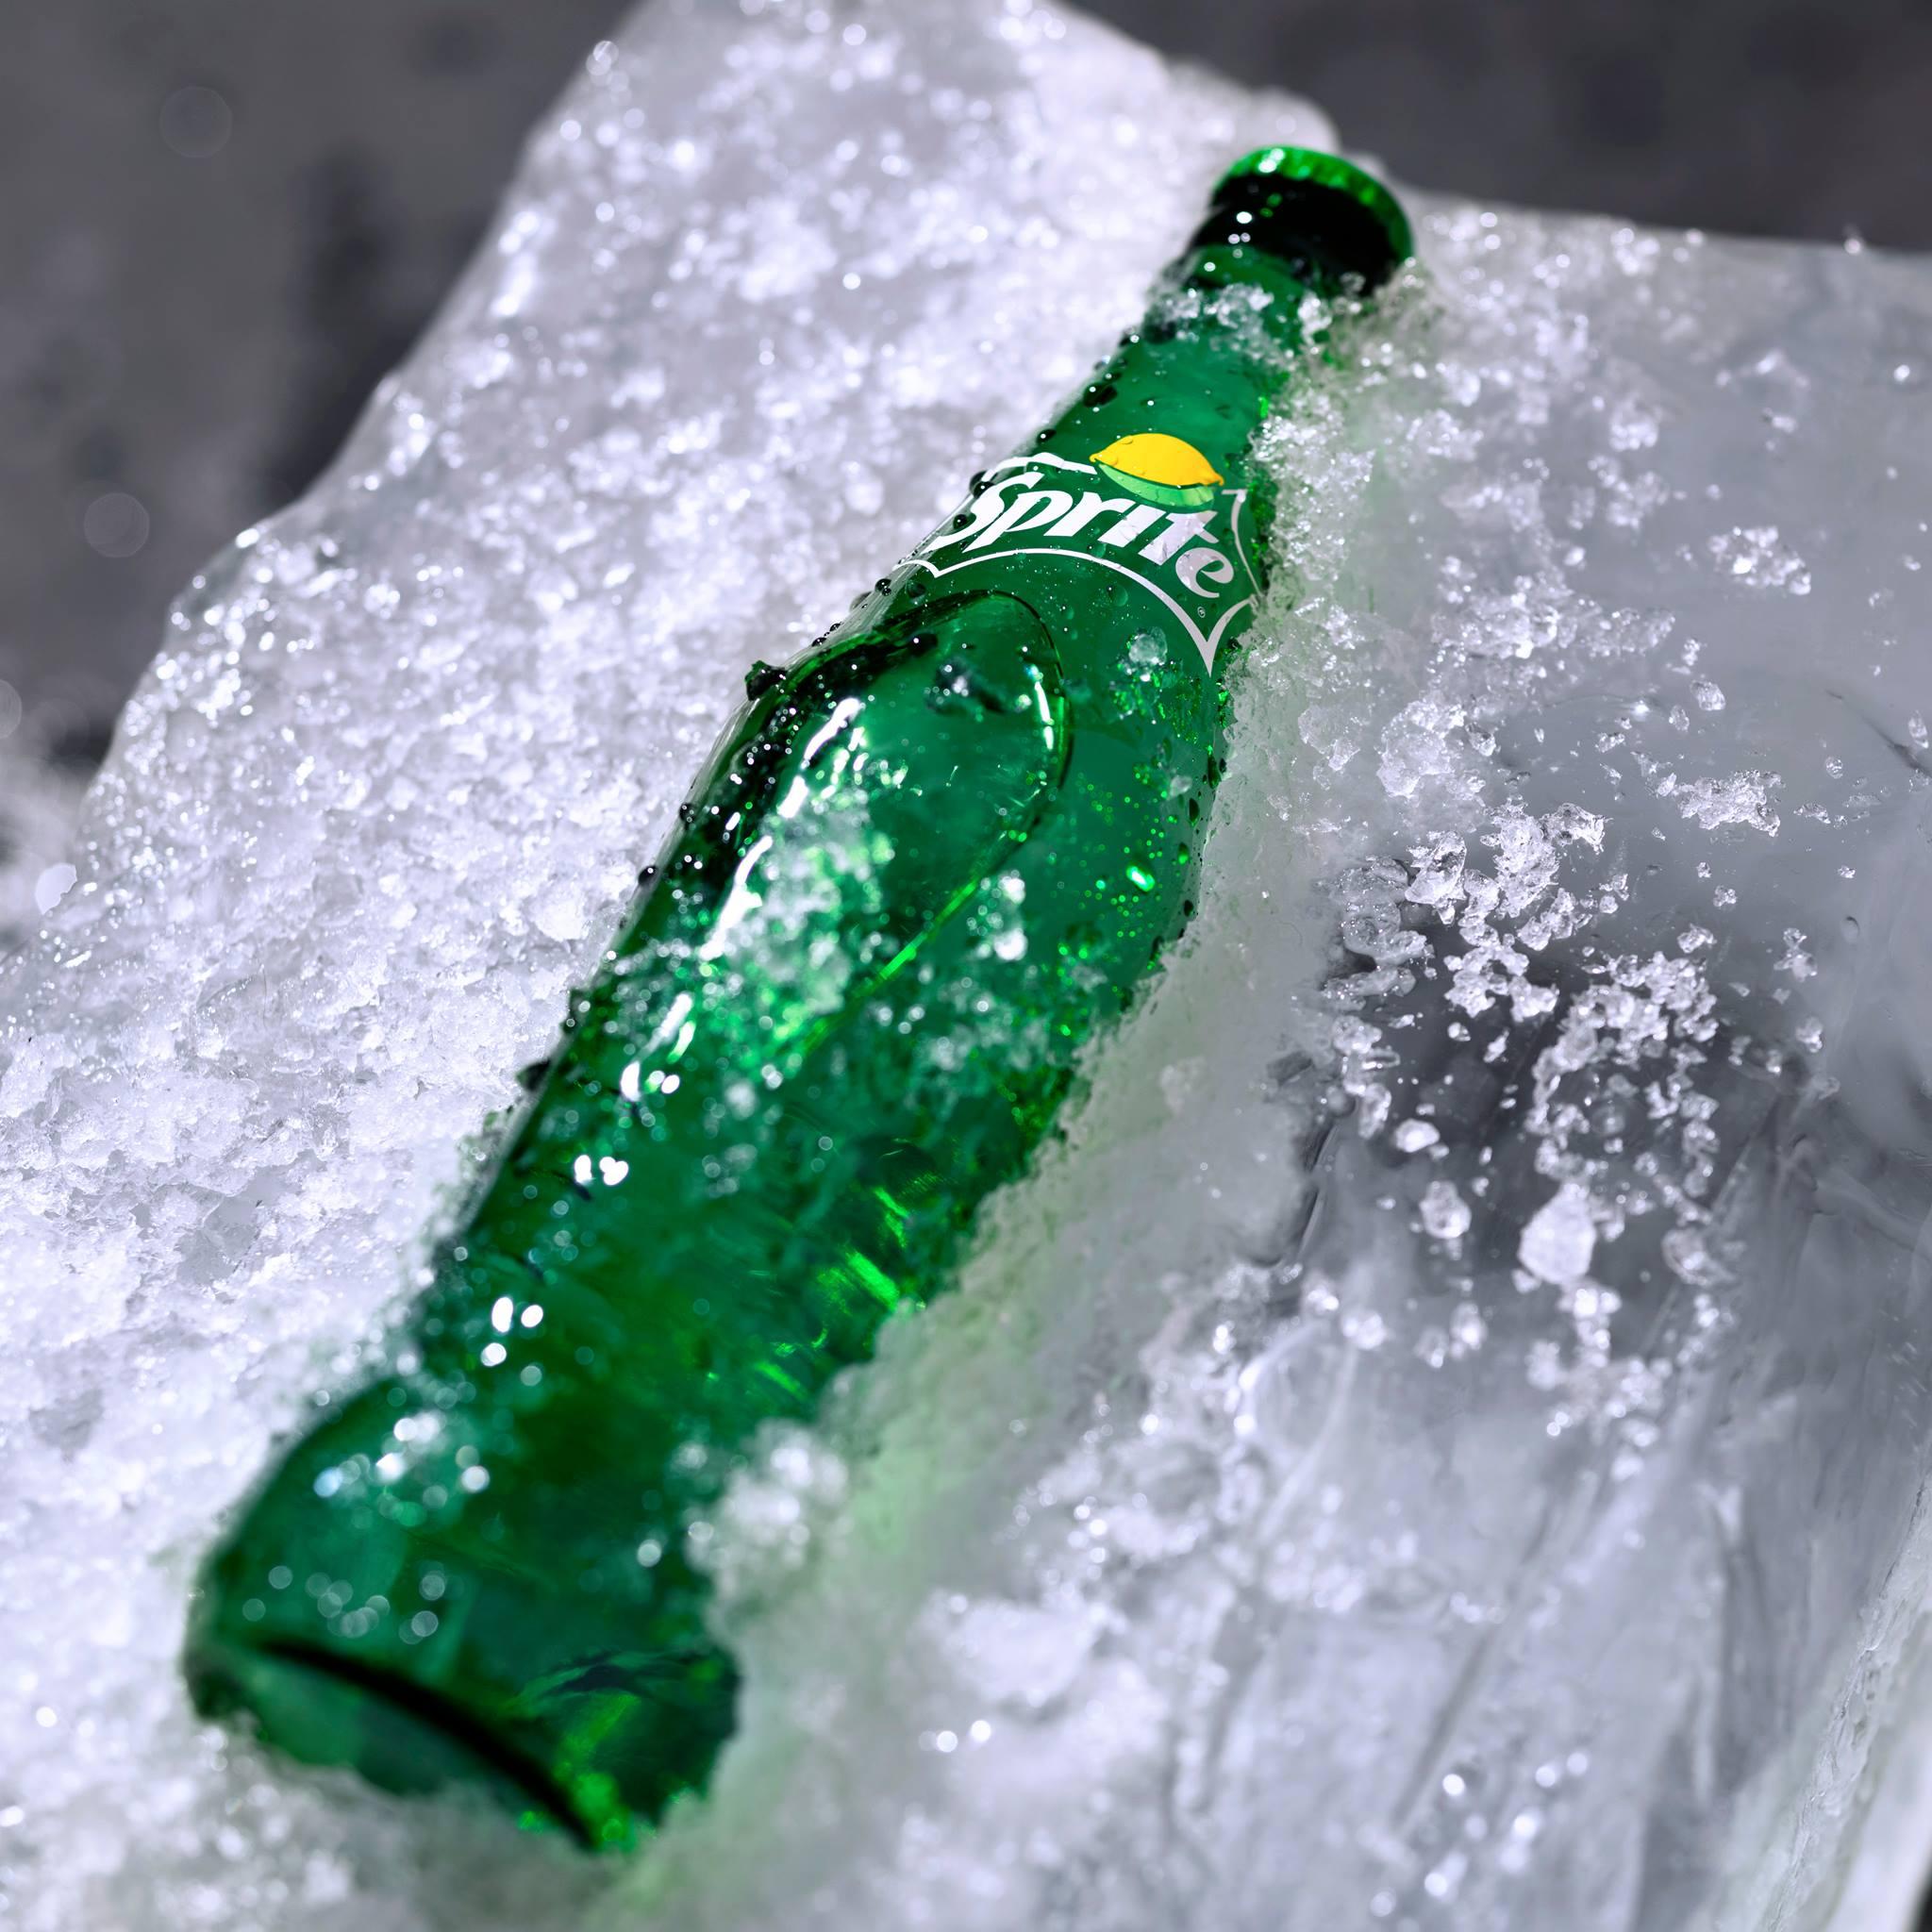 ice cold sprite